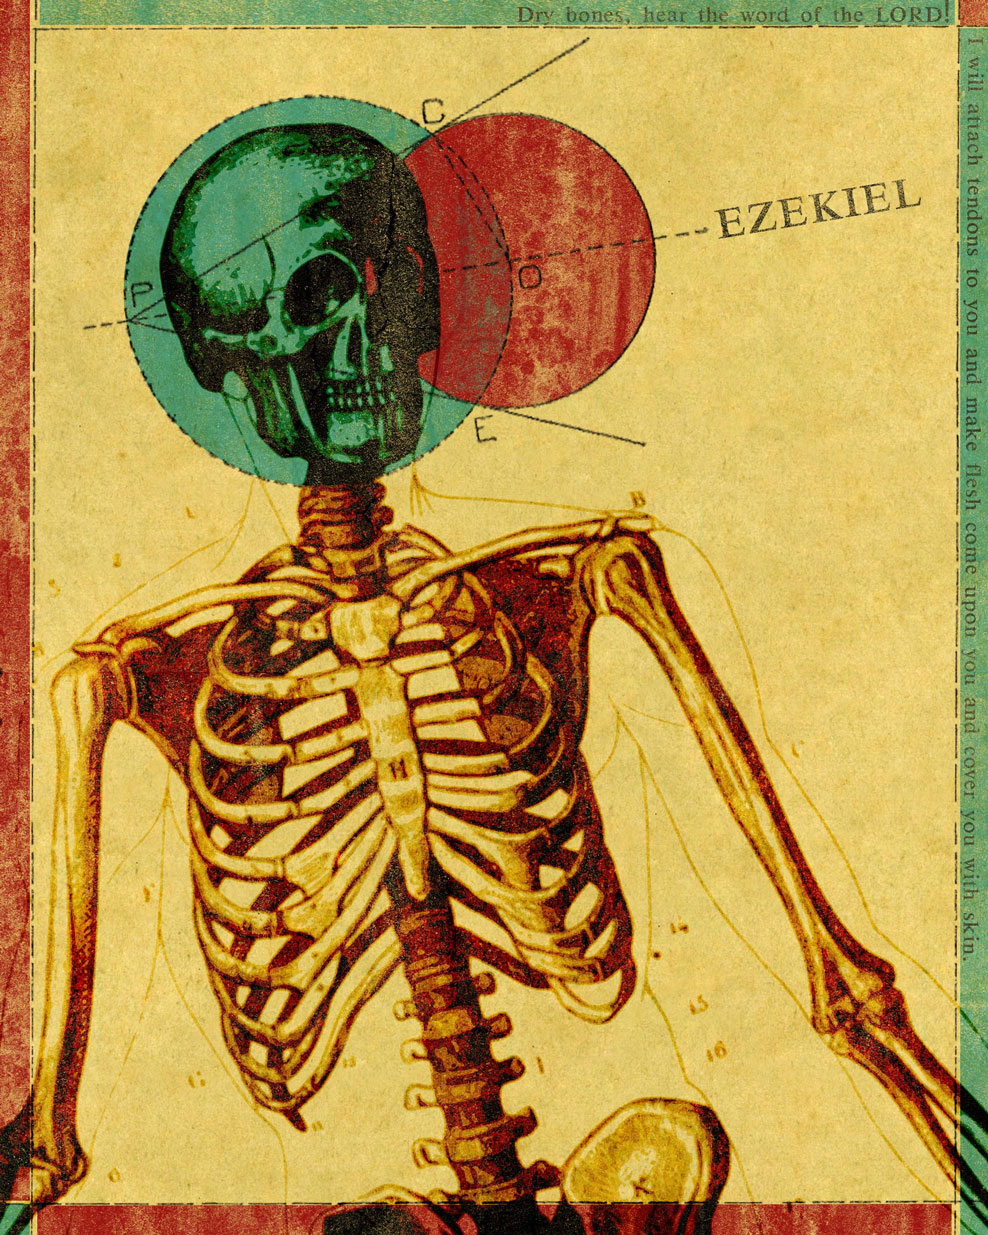 26-Ezekiel_Jim-LePage.jpg